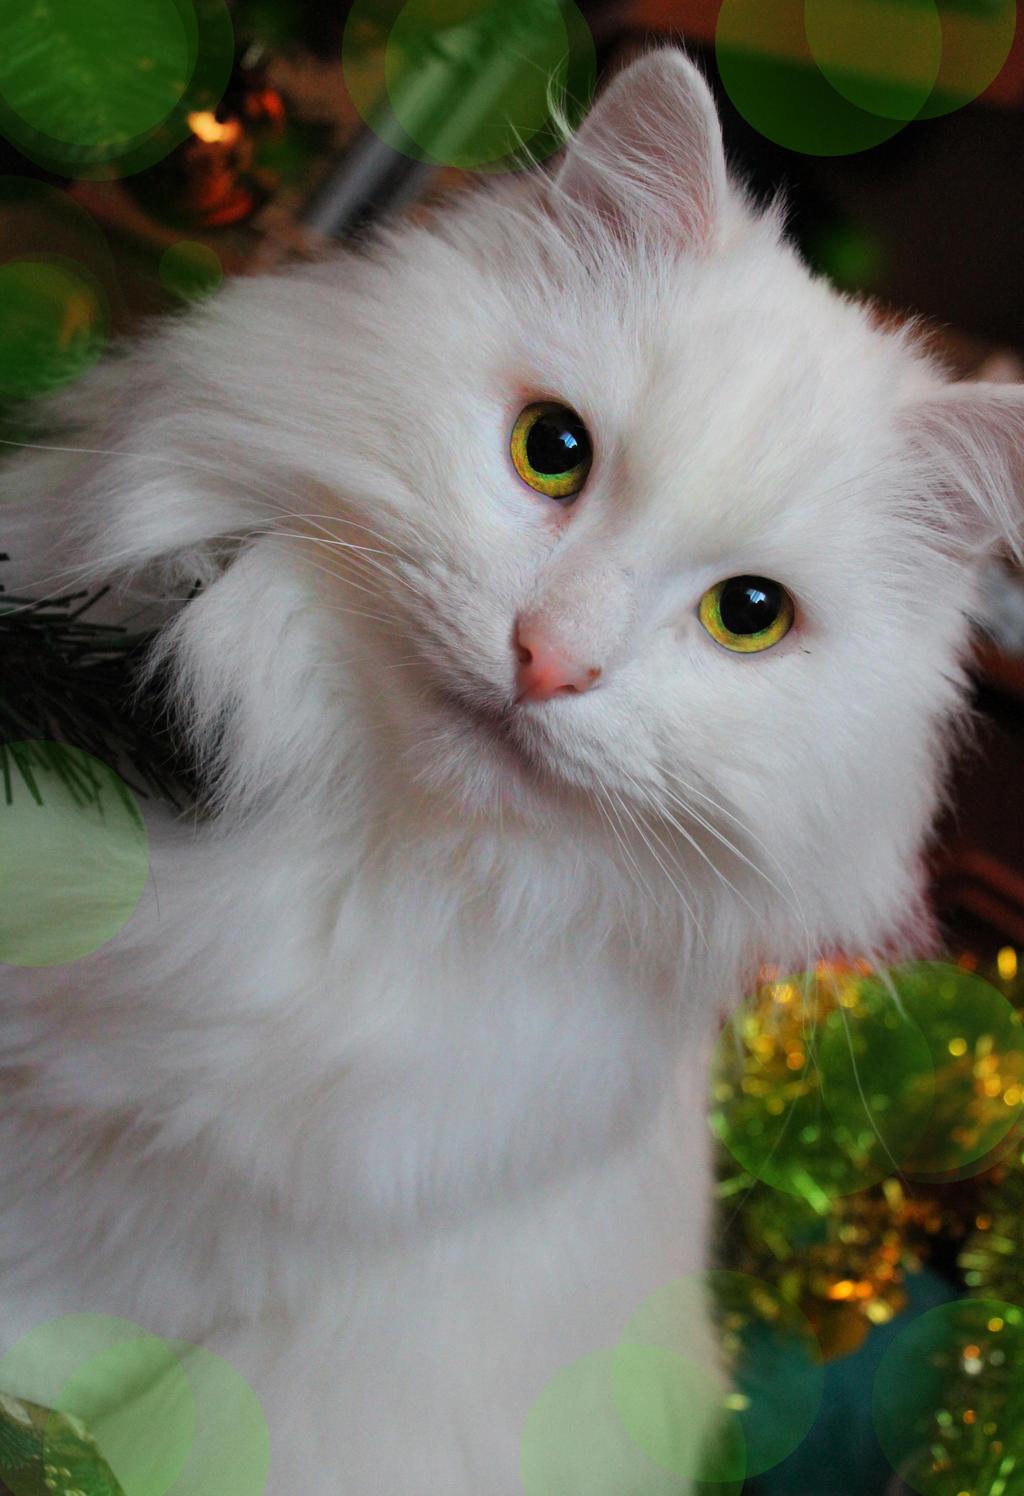 Alex the cat my dearest friend. R.I.P. by MonotoneInkwell